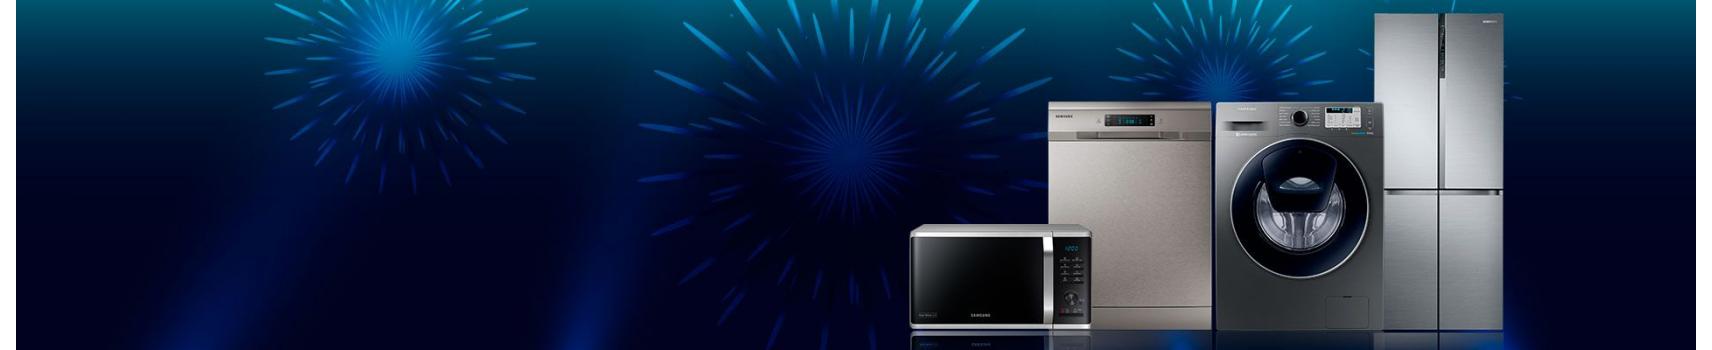 Promo fin d'année Samsung Tunisie